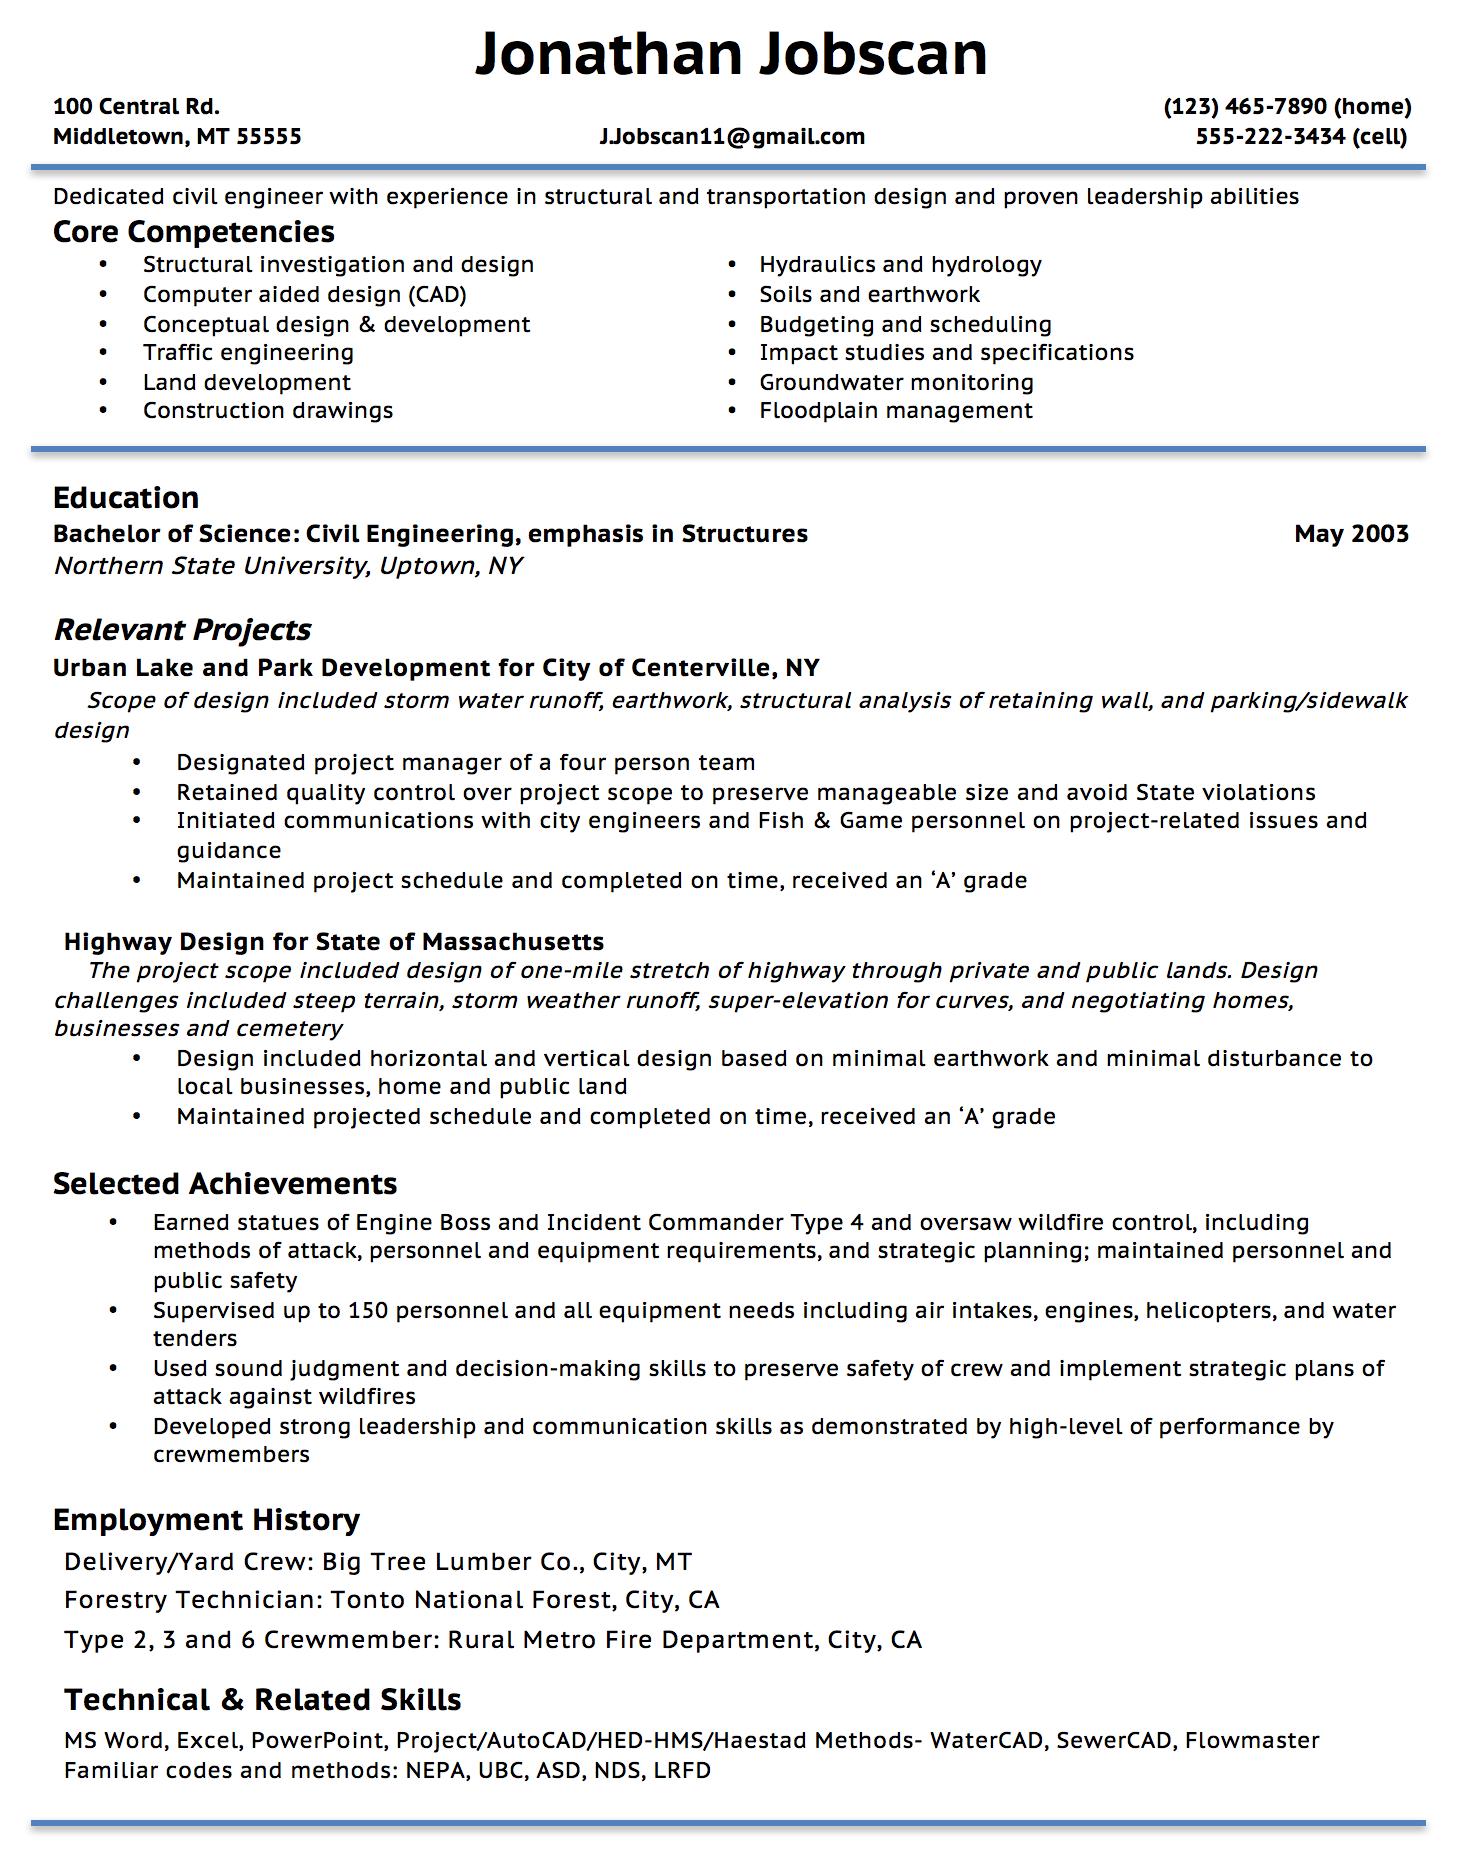 Resume Format Guide